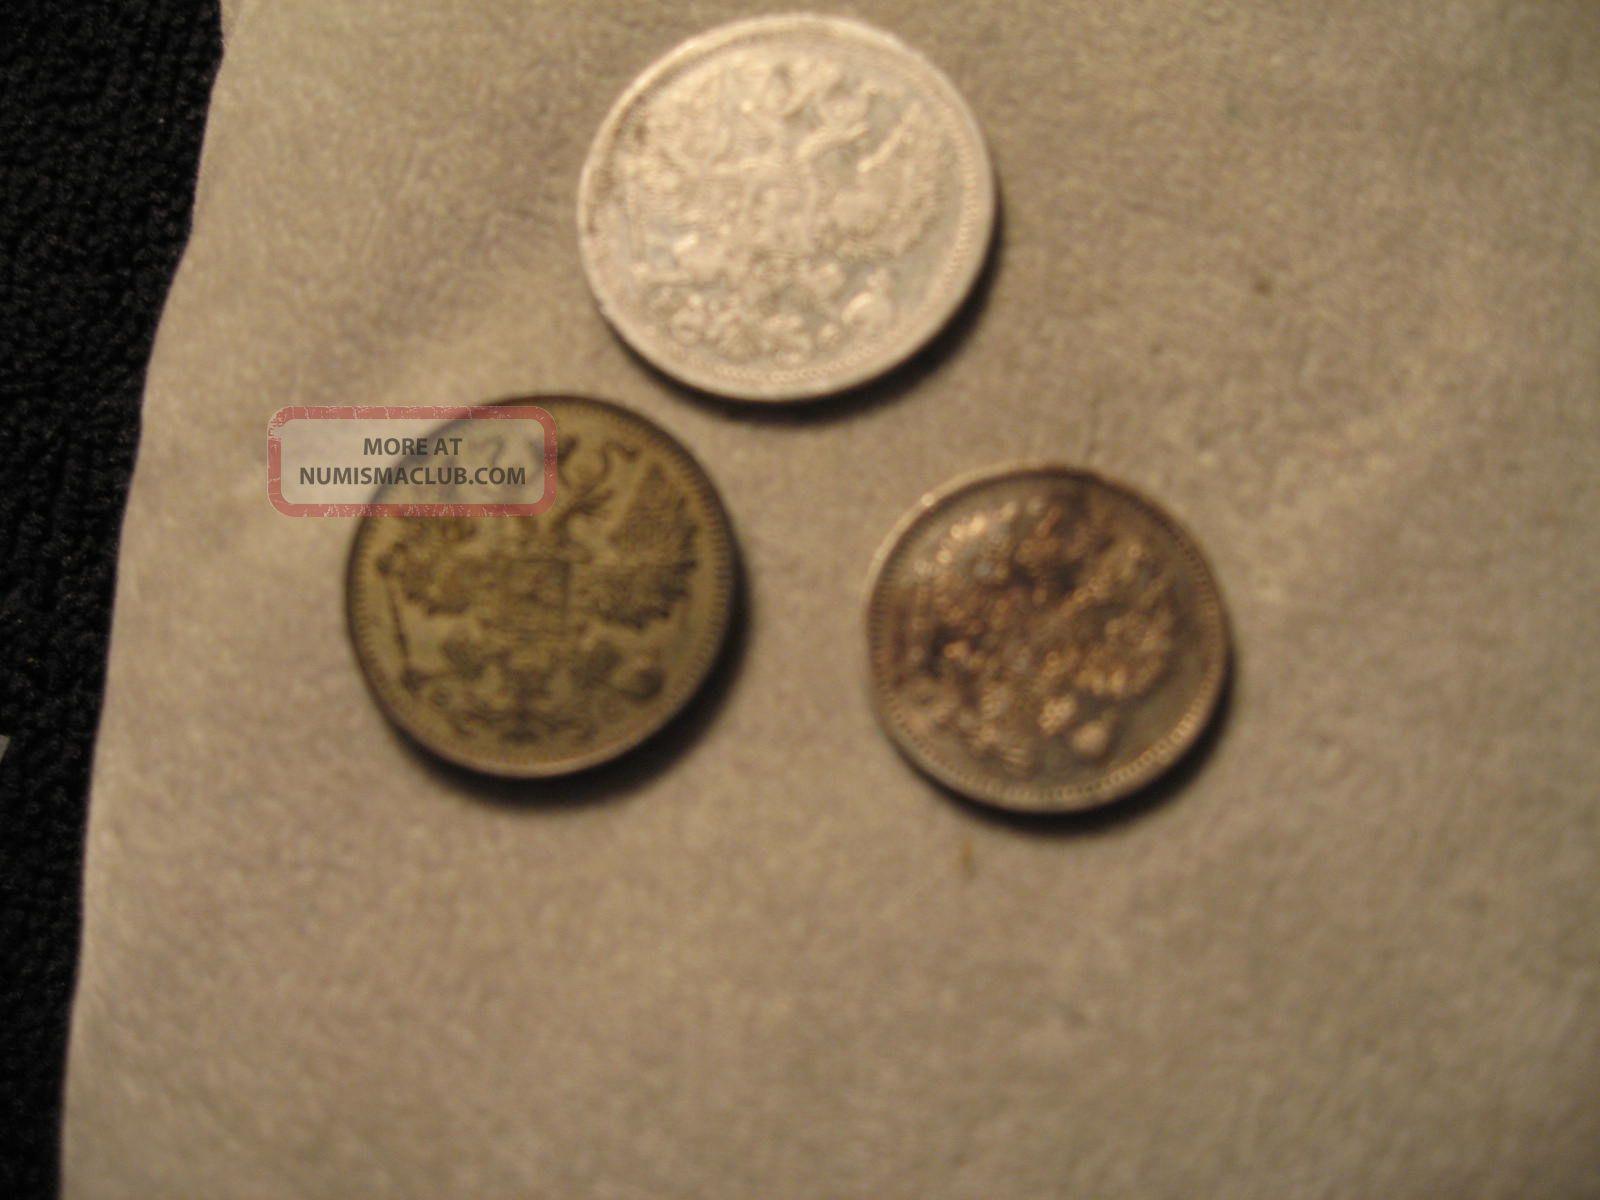 Russian Empire Silver Coin 15 Kopek1916,  20 Kopek1879,  10 Kopek 1913 Nicolas Ll Russia photo